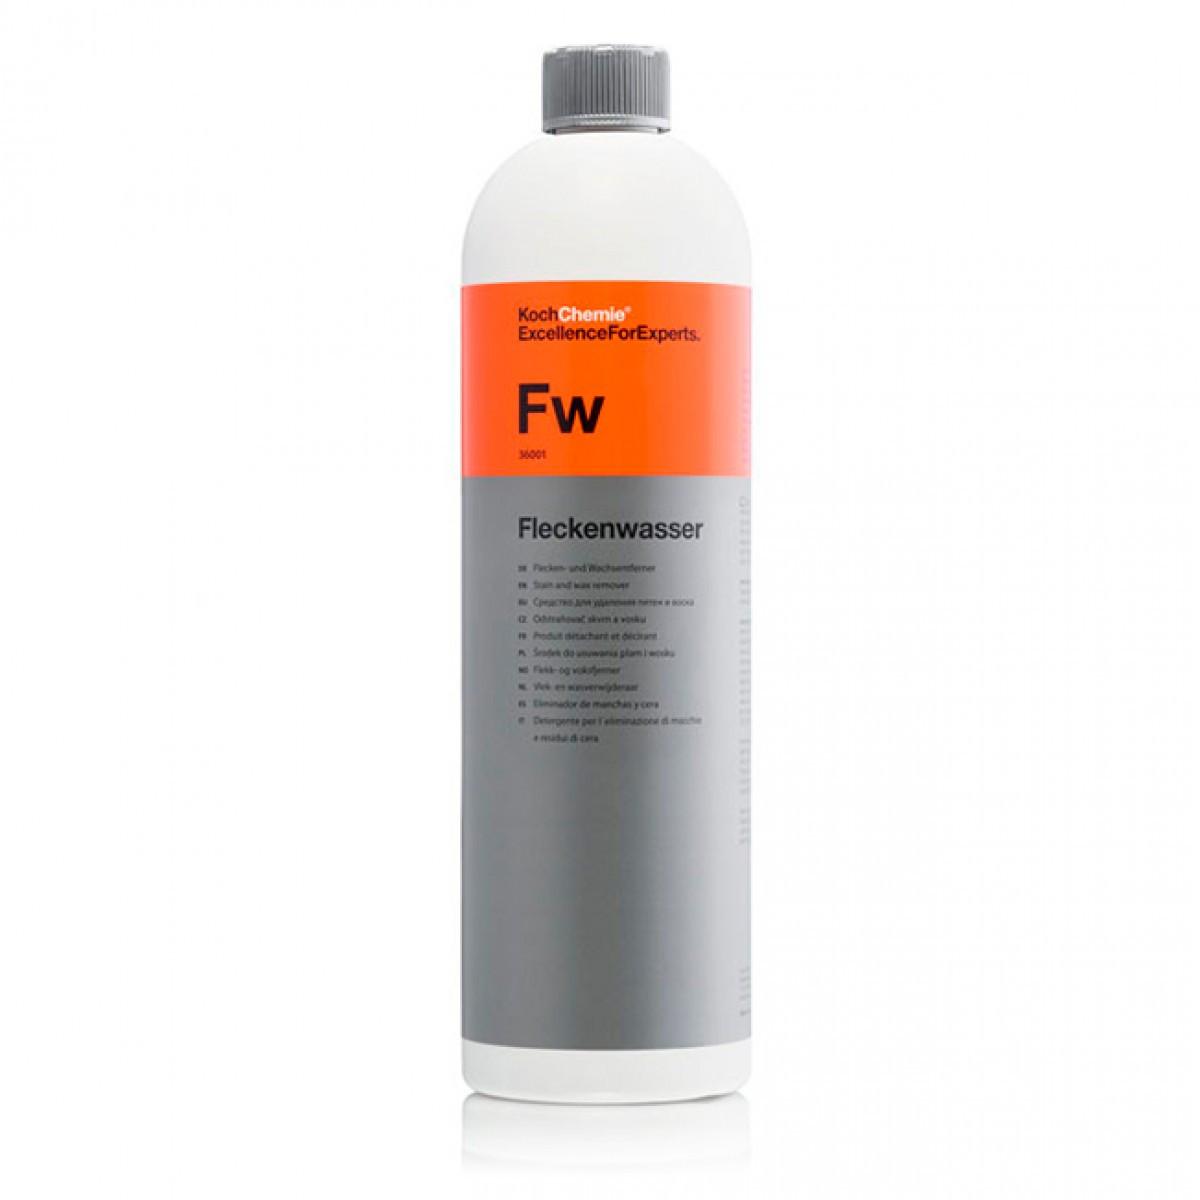 Fw Пятновыводитель Koch Chemie FleckenWasser